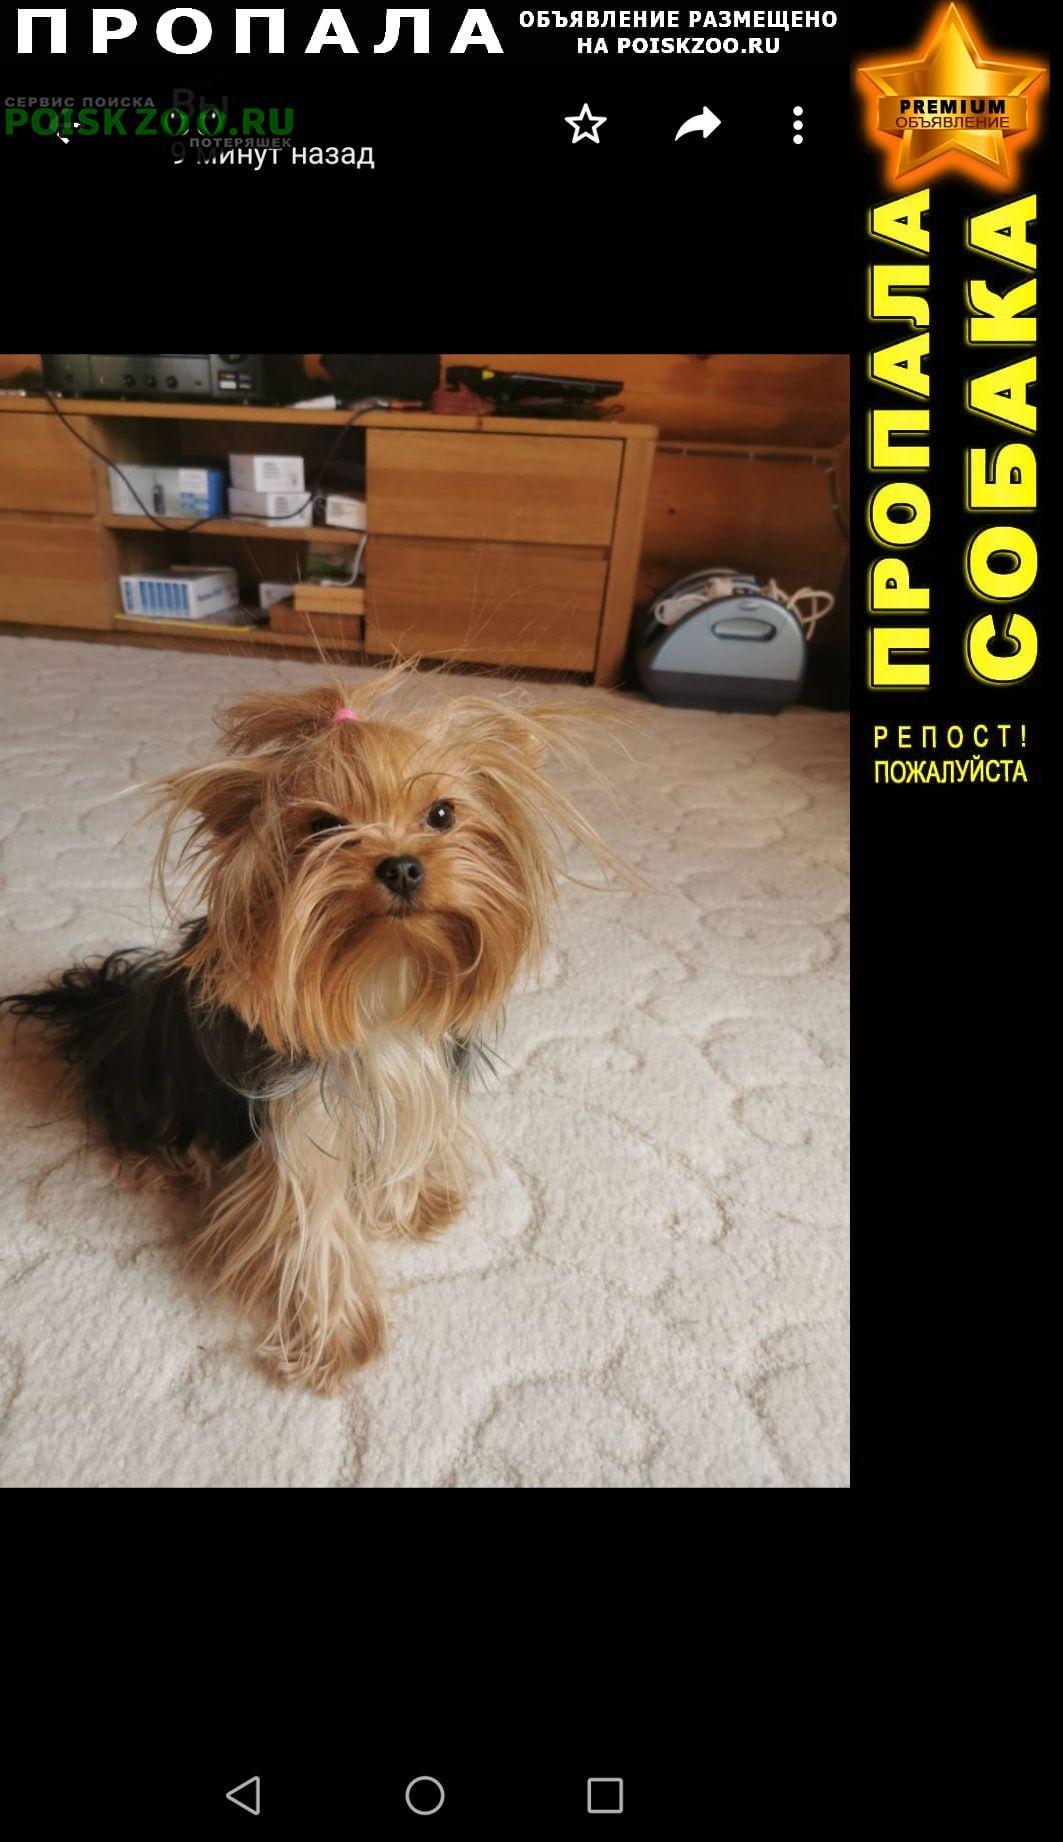 Пропала собака Черногорск Хакасия